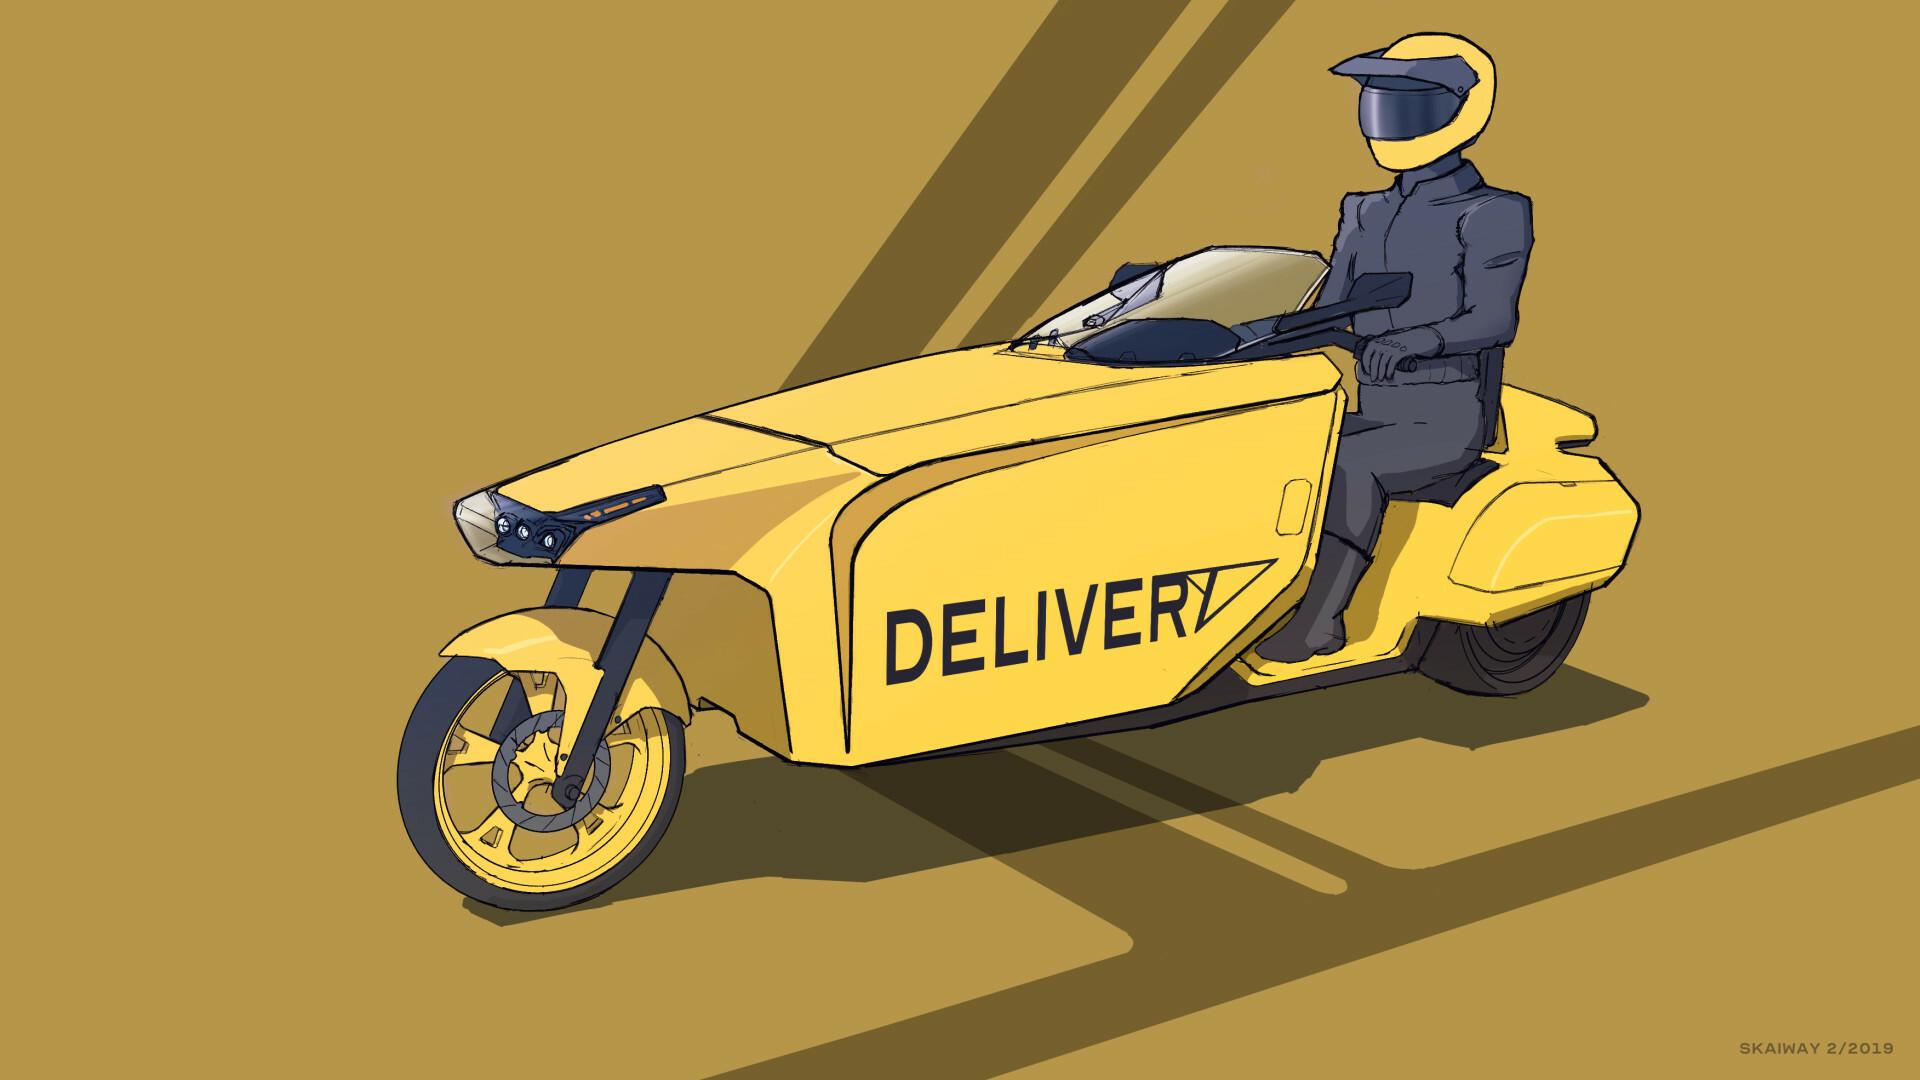 Skaiway deliverymotorcycle